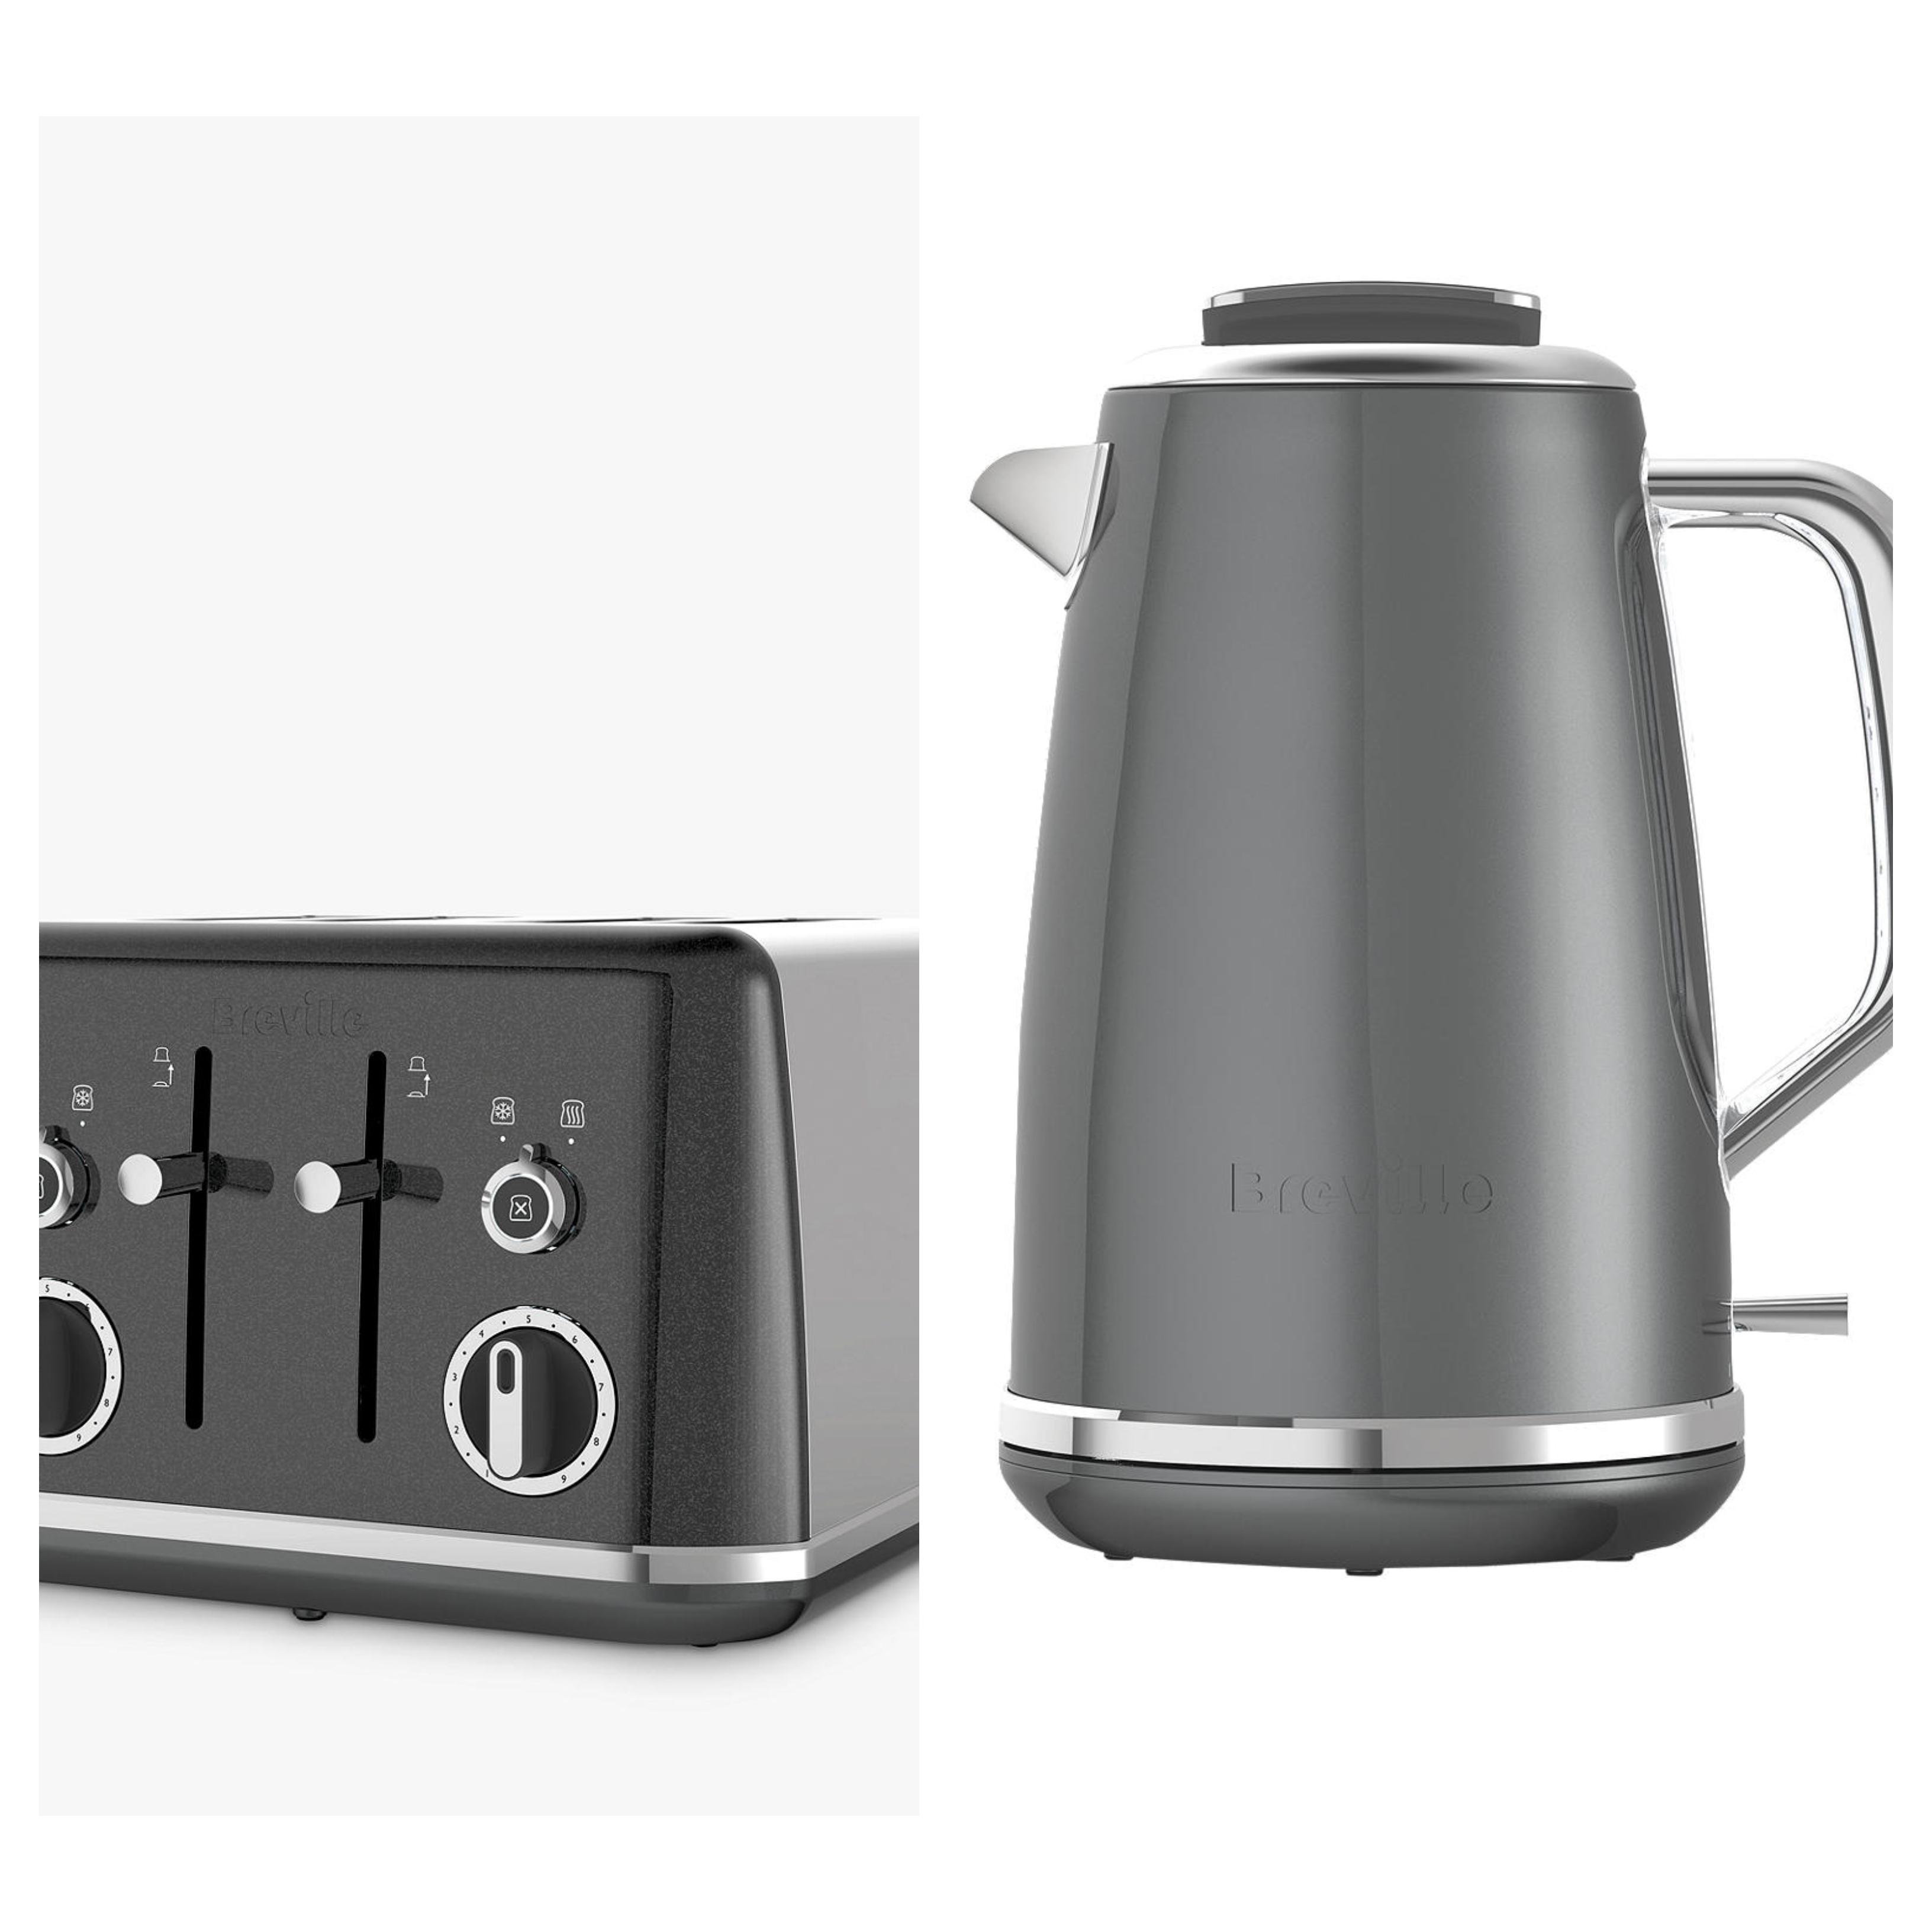 Breville Lustra 4-Slot Toaster, Grey - £16.00 // Breville Lustra Kettle, Grey - £16.00 (£2 C&C, free at £30.00) @ John Lewis & Partners